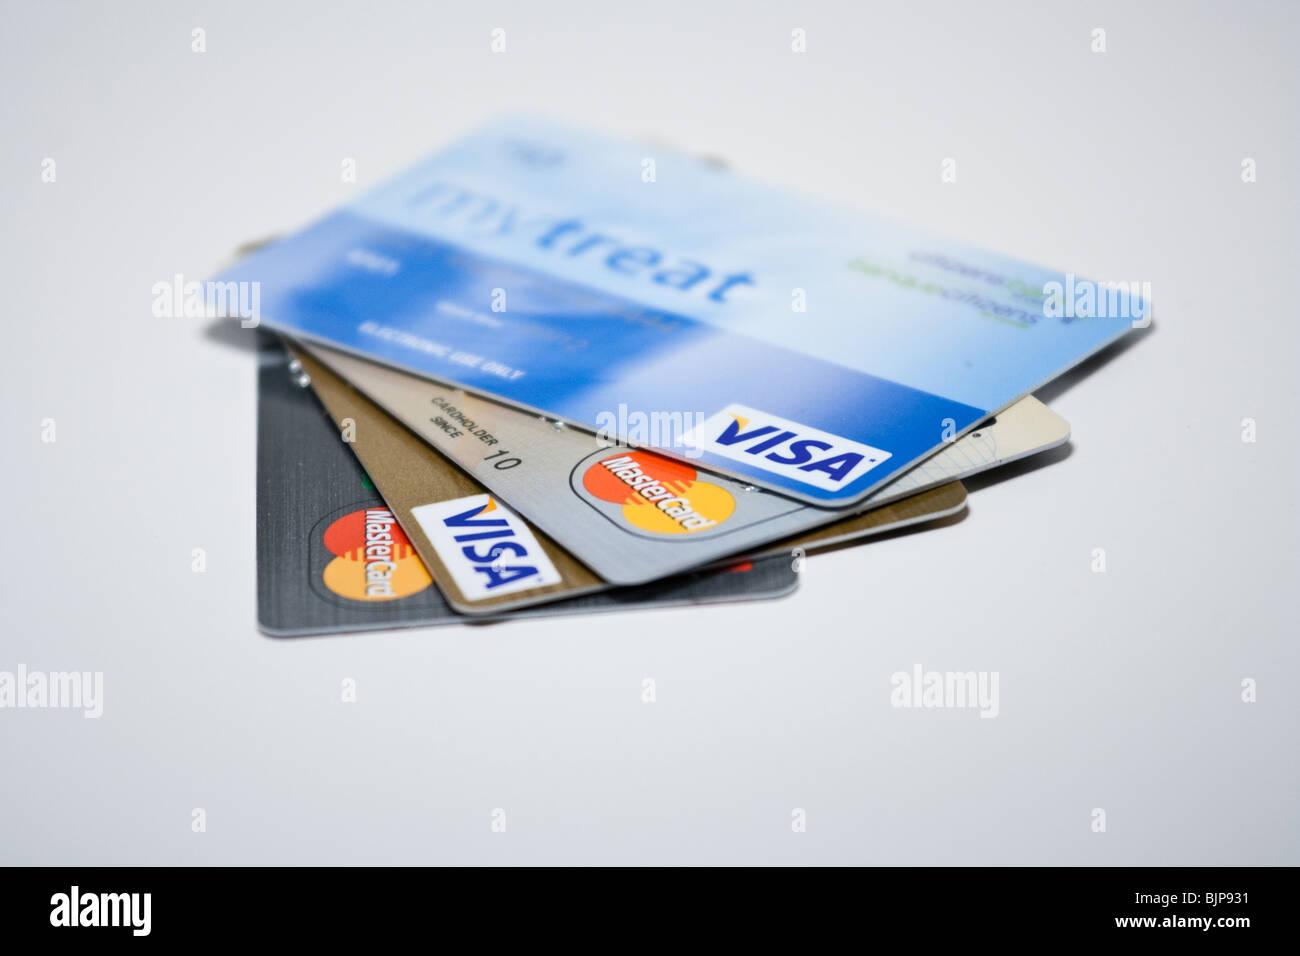 credit cards debt visa mastercard bank credits payment finance loan - Stock Image